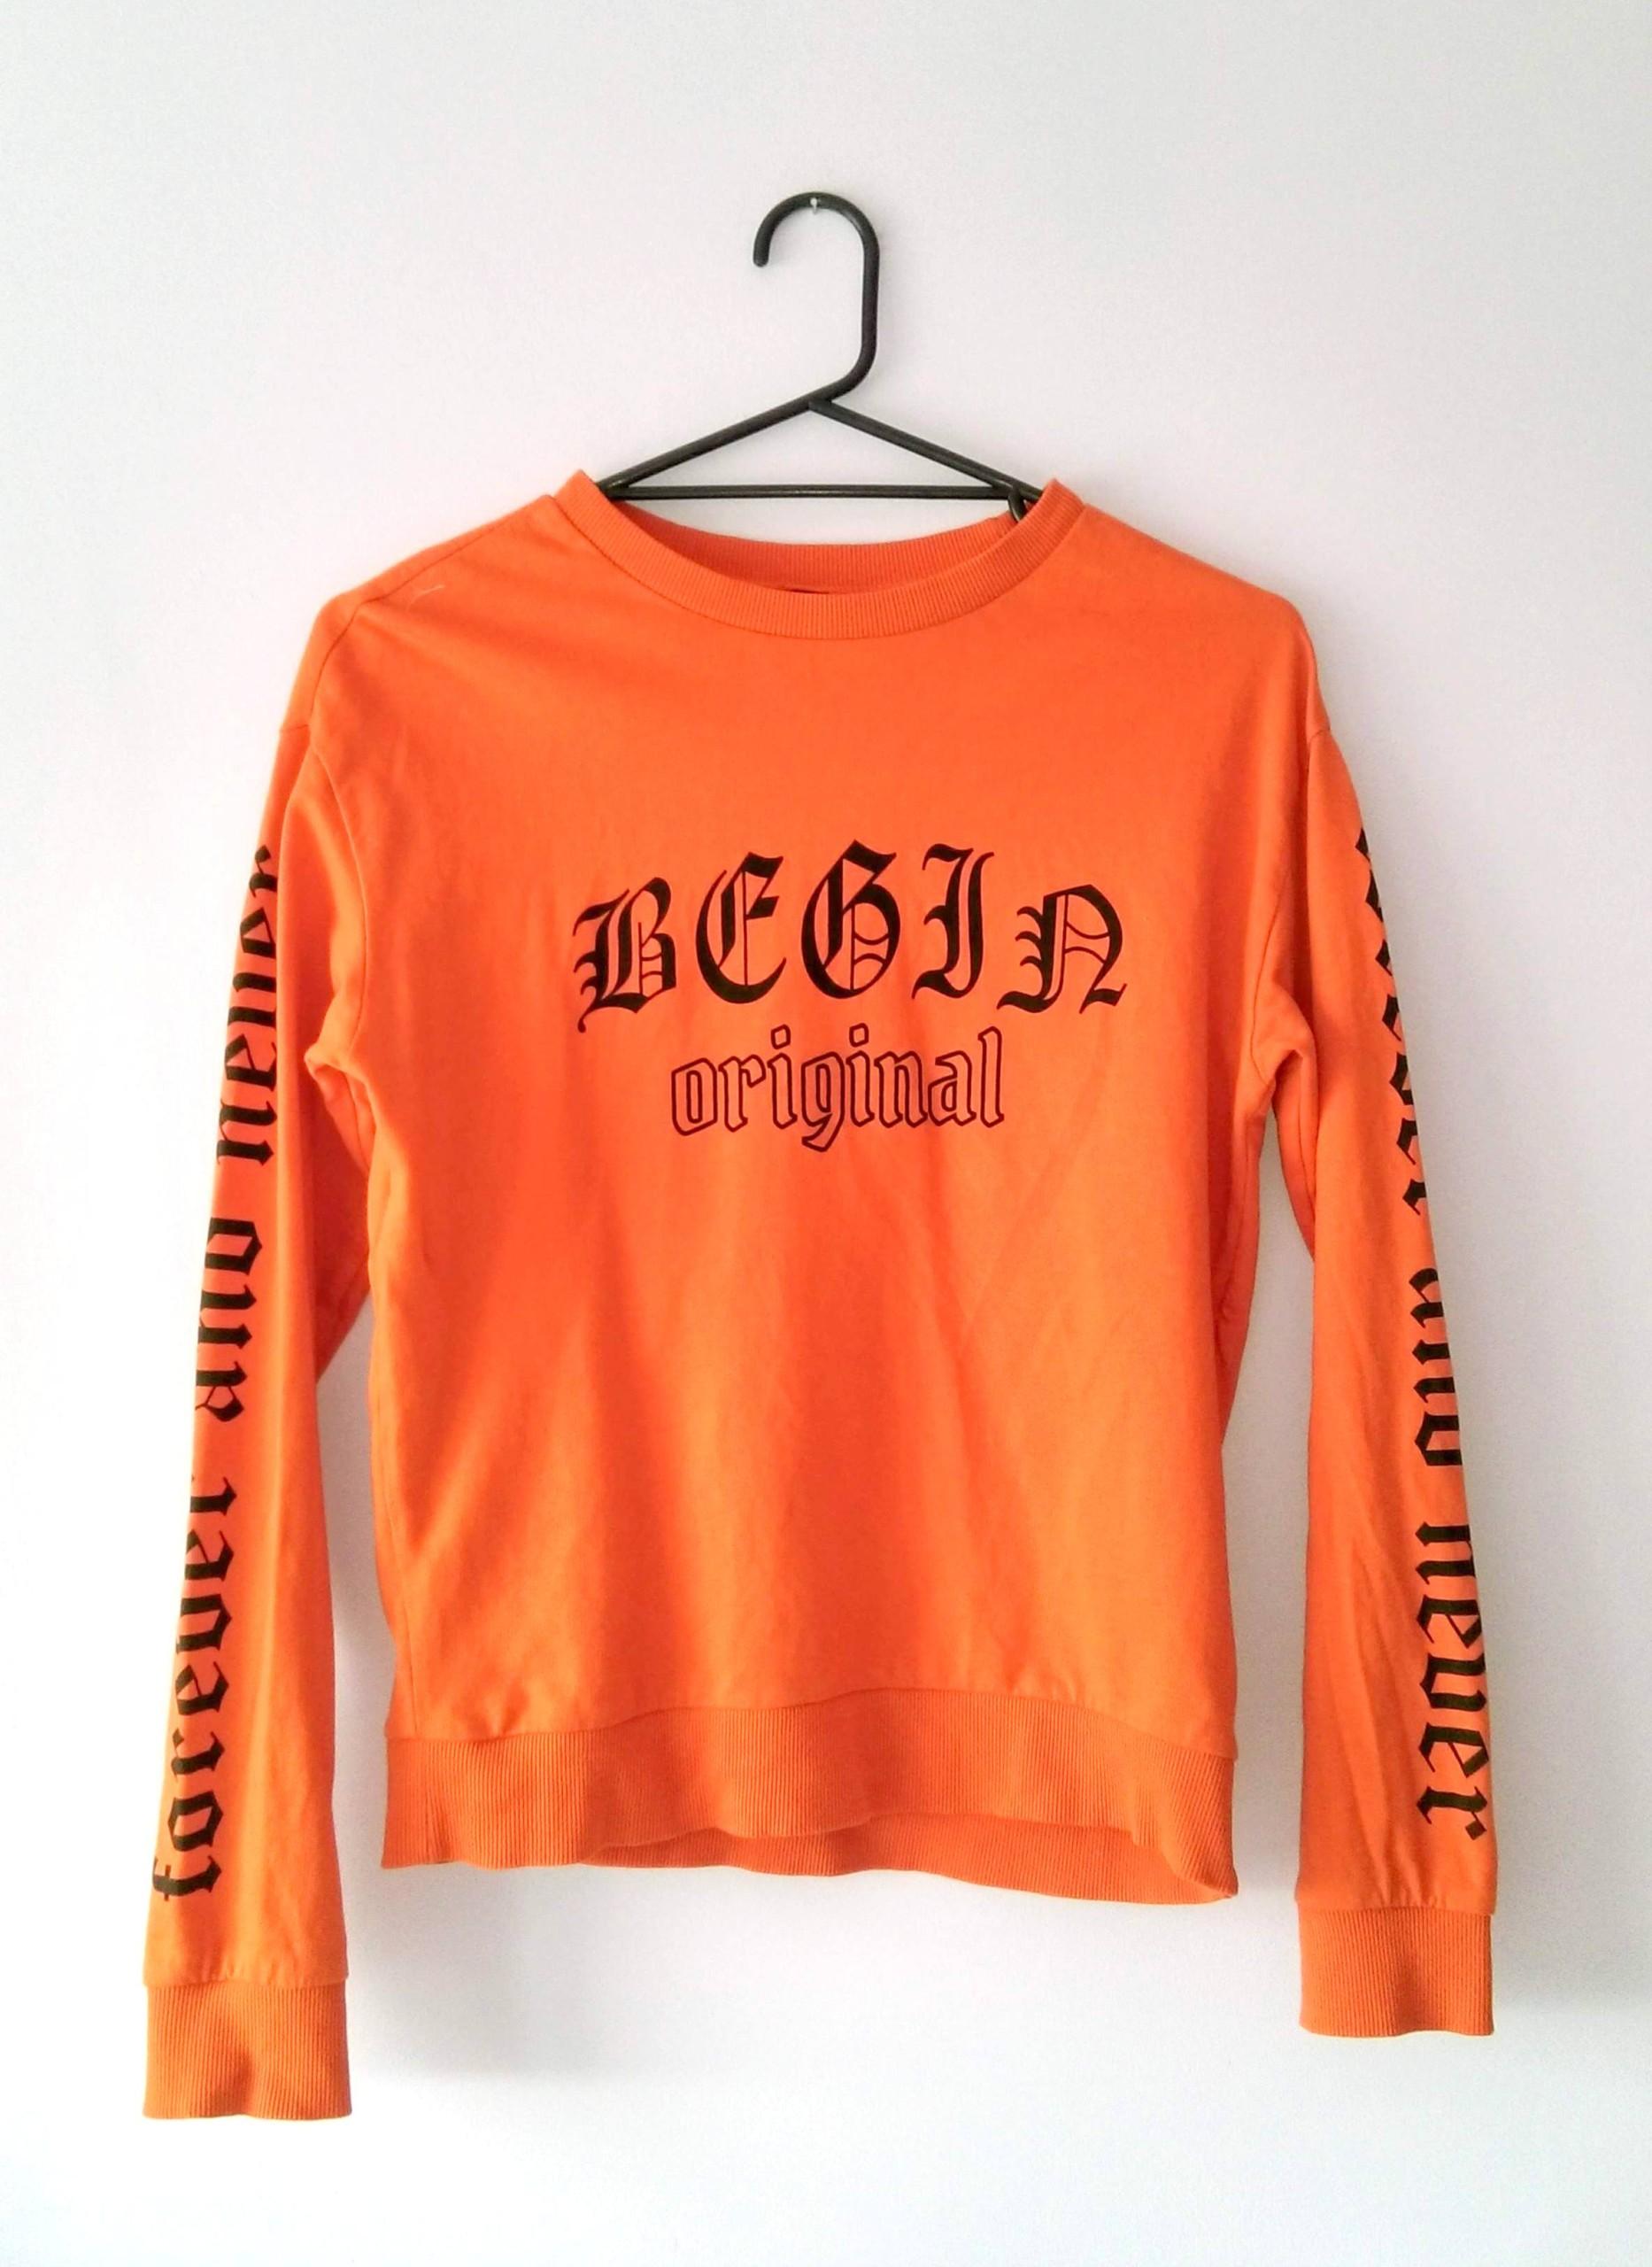 H&M DIVIDED bluza pomarańczowa napisy XS 34